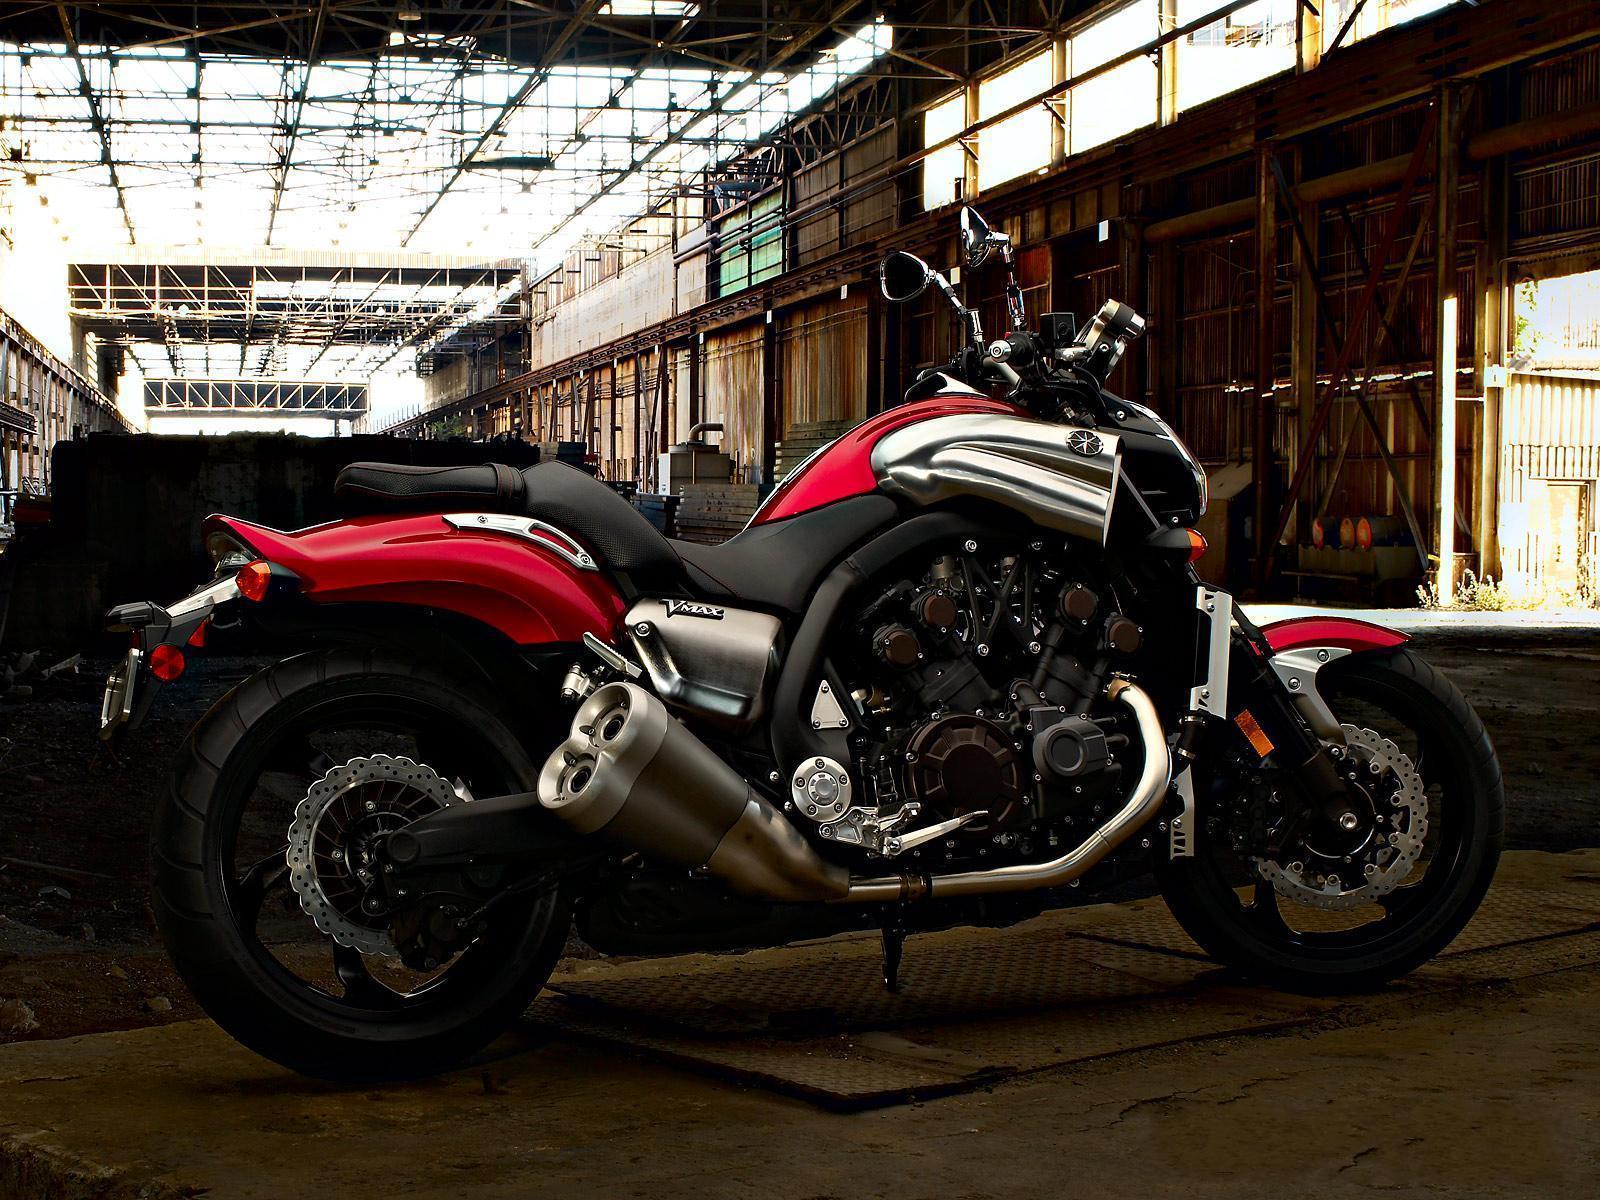 Super Bikes Motorbikes Bike: Superbike Wallpapers